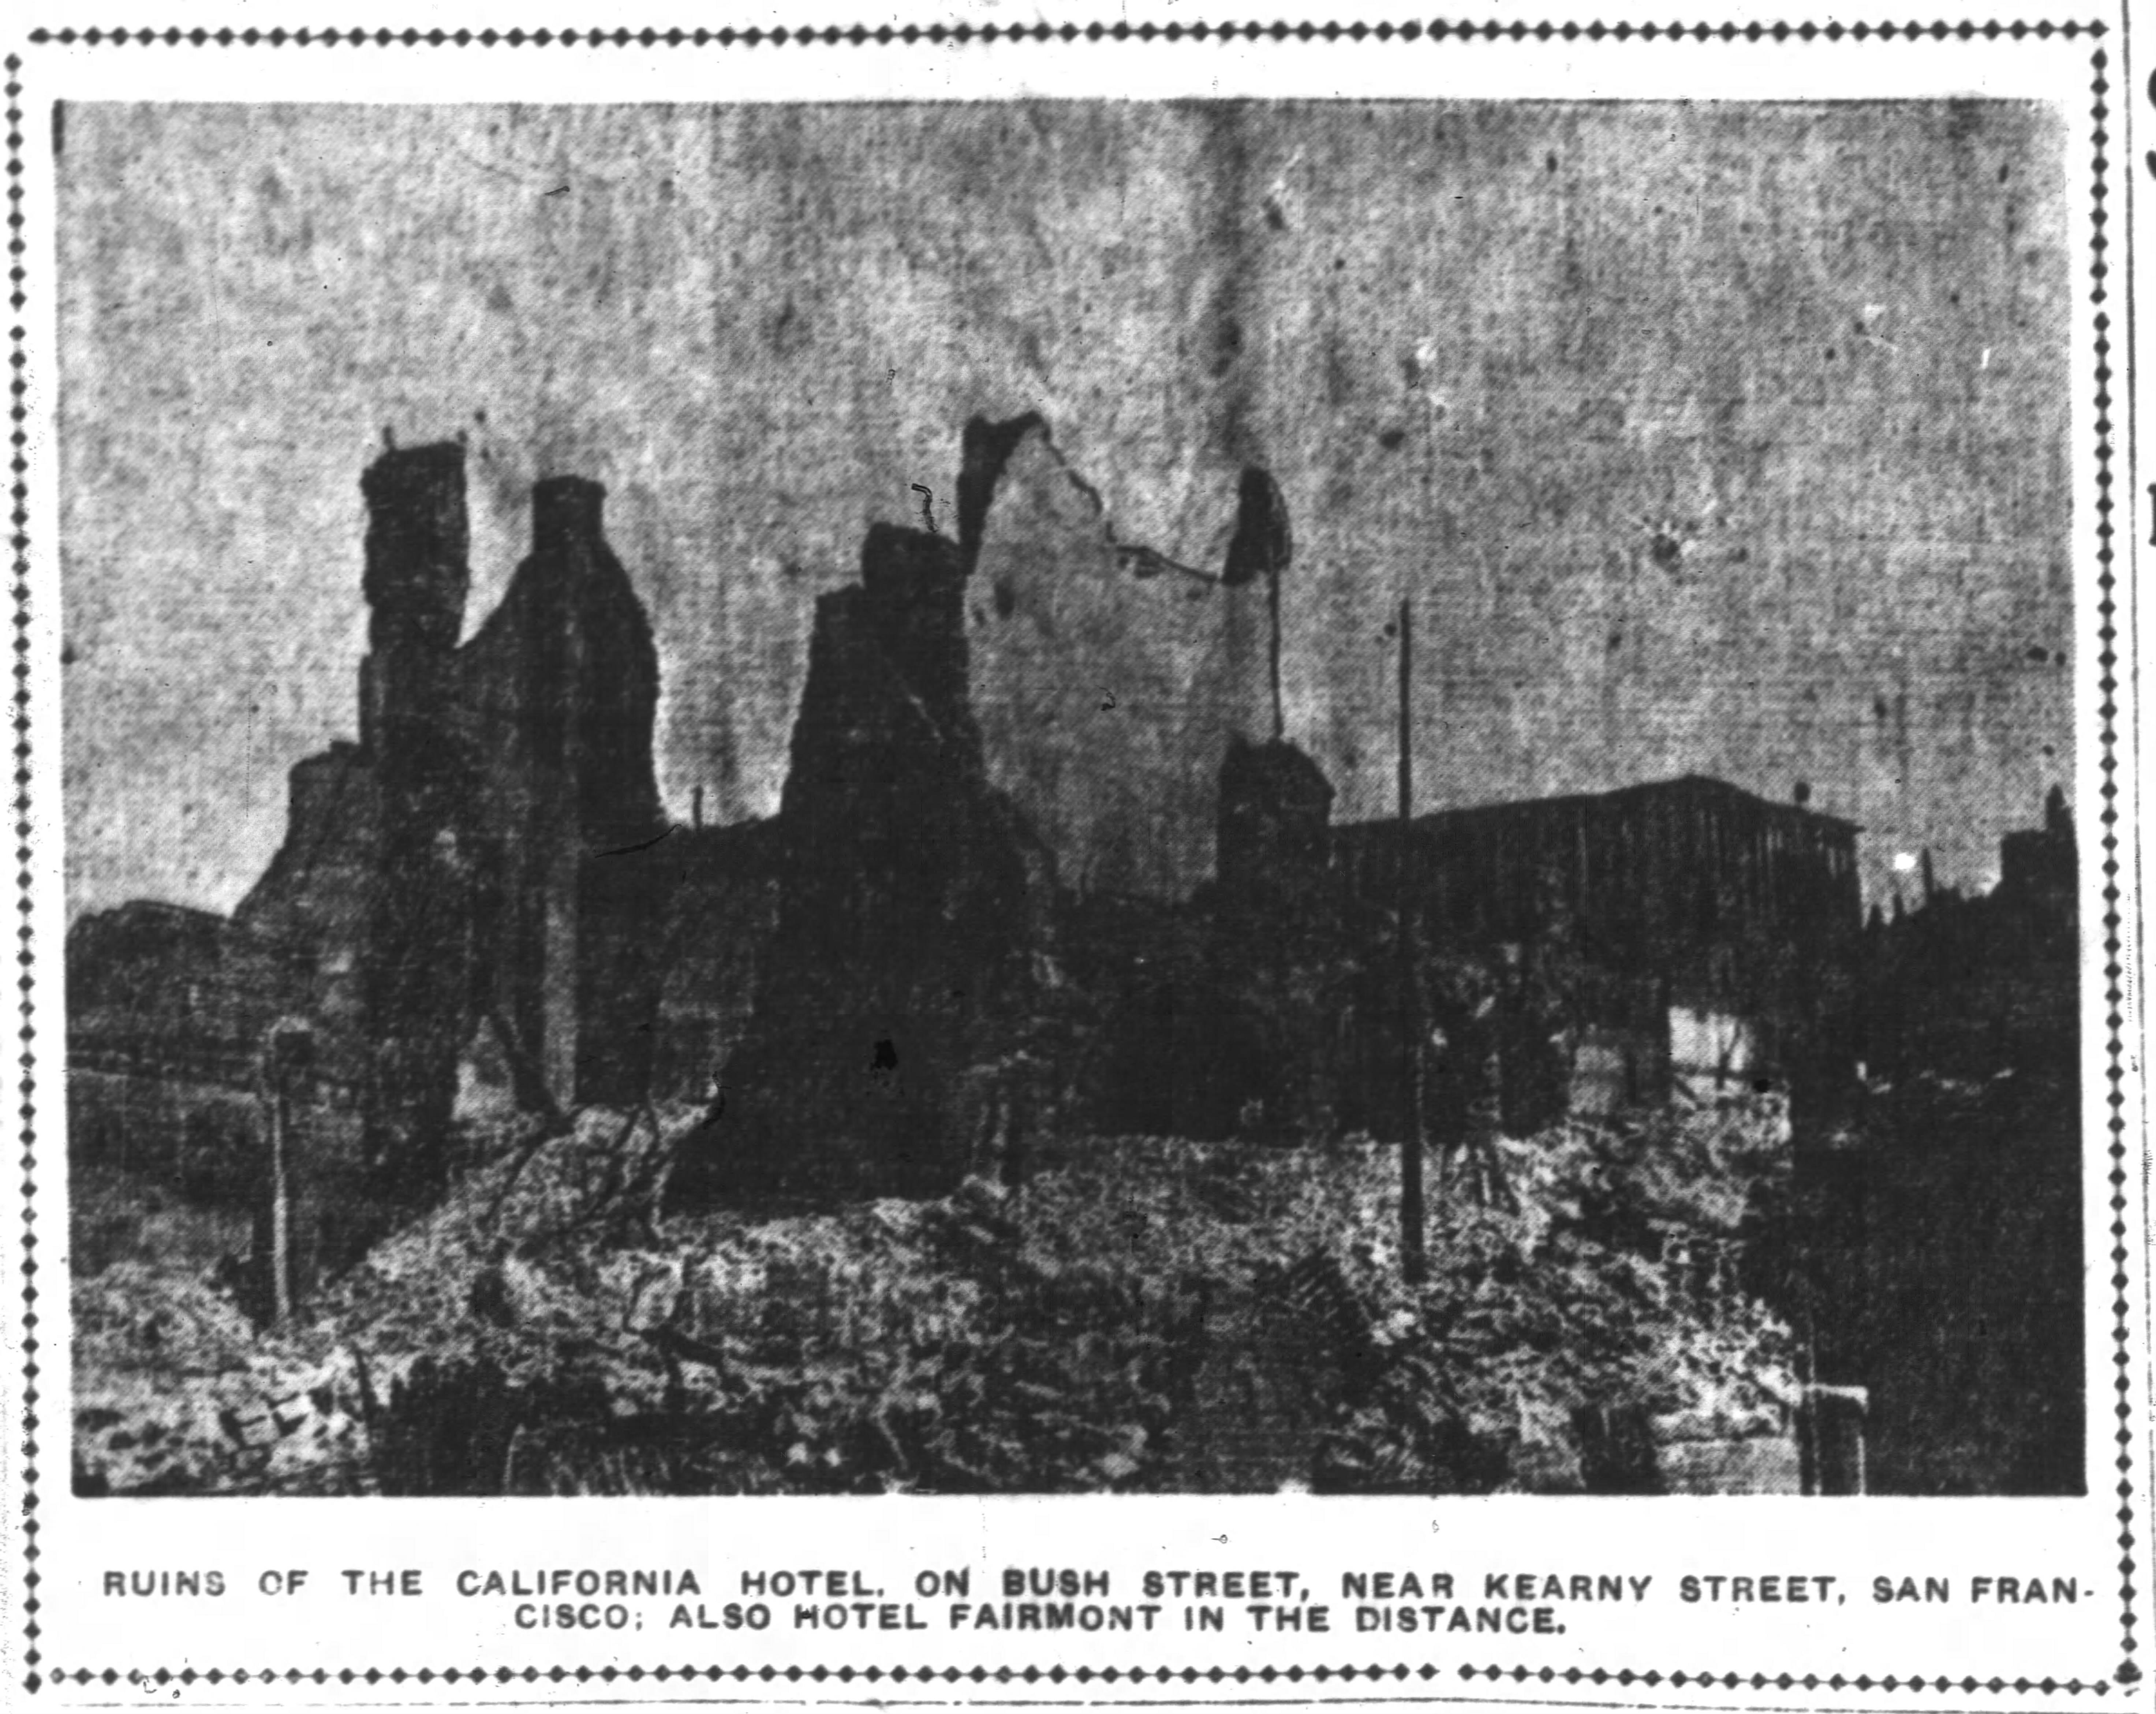 oakland-tribune-fri-may-11-1906.jpg